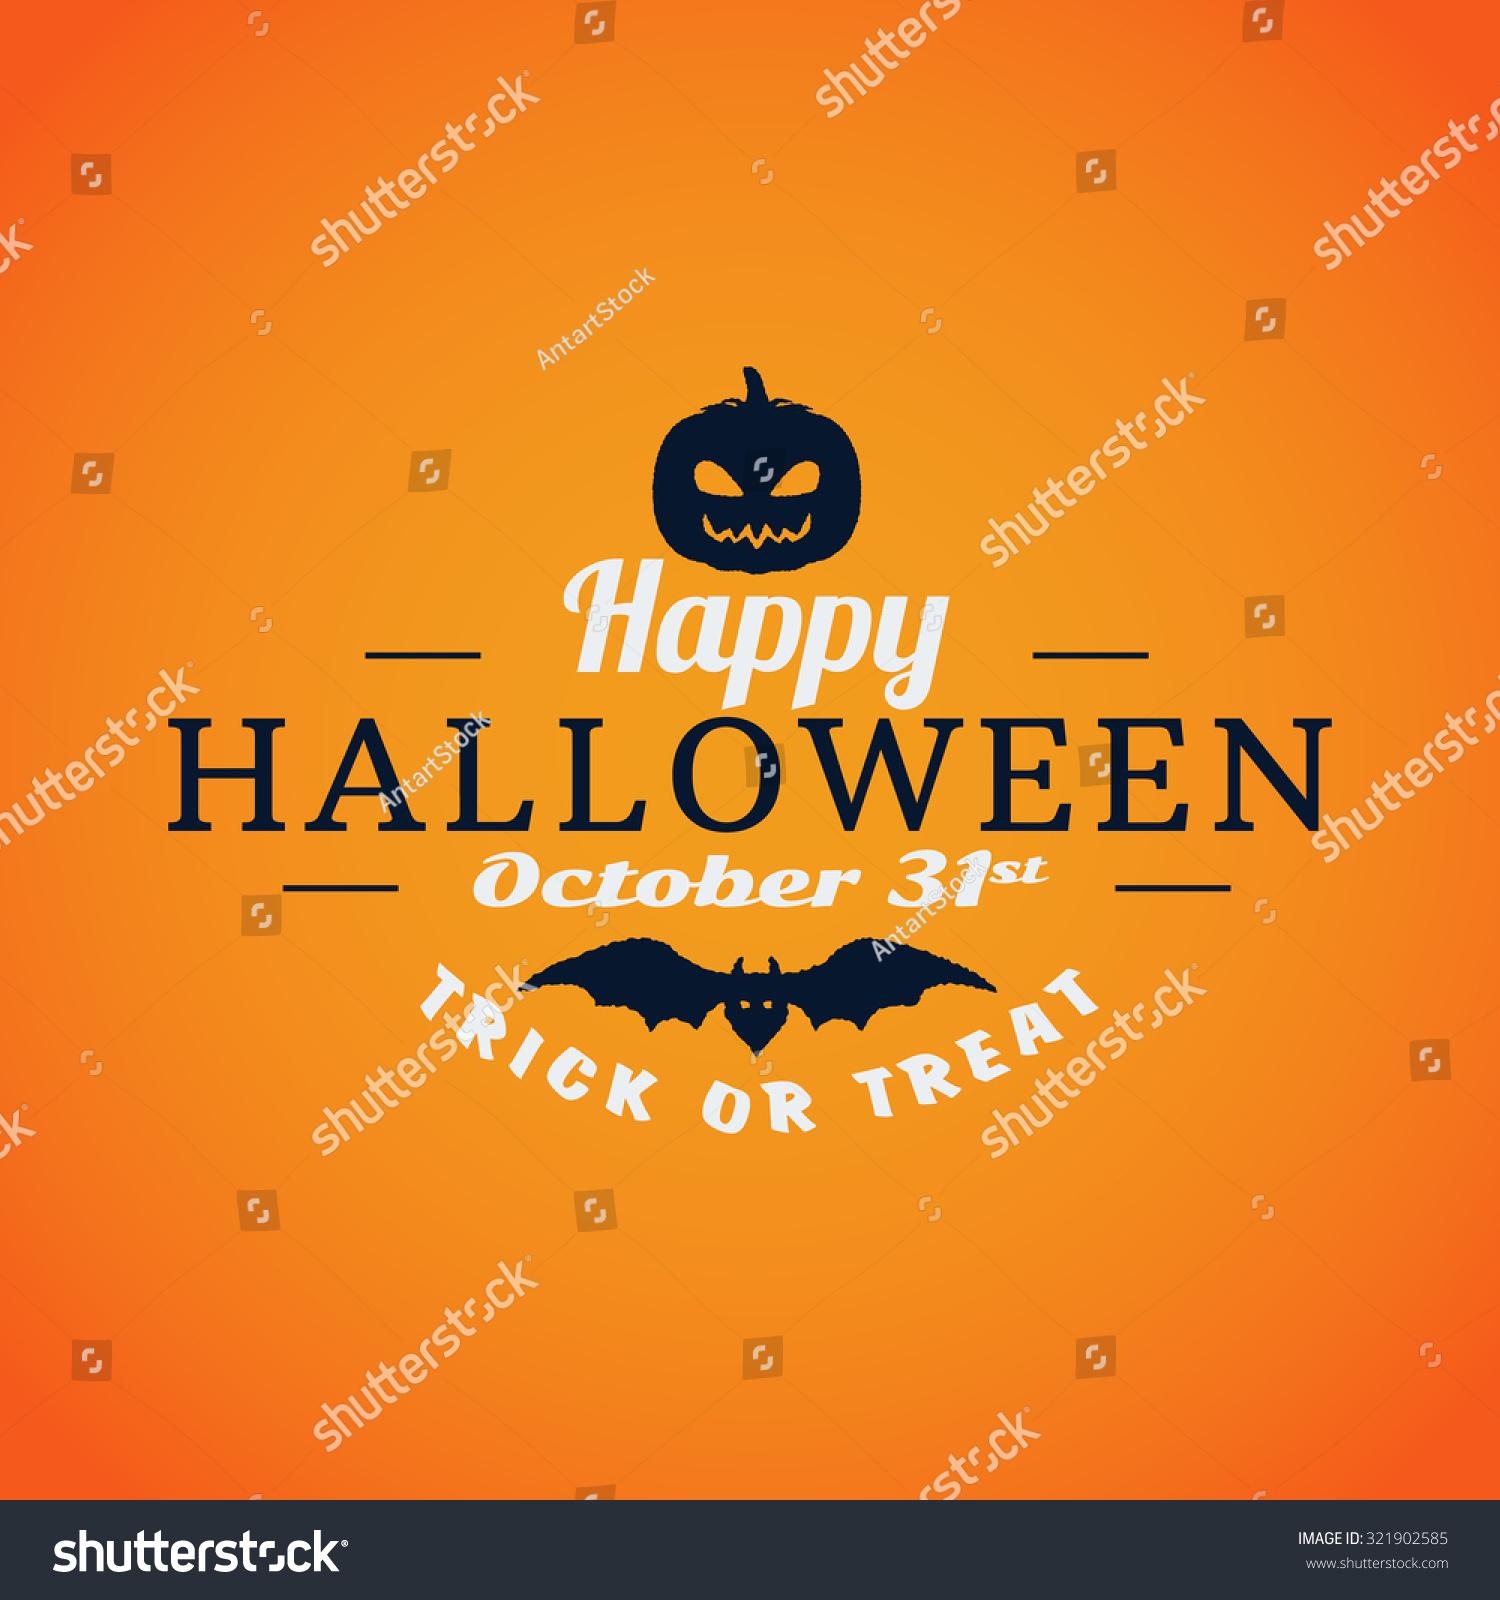 Halloween Birthday Wishes – Execid